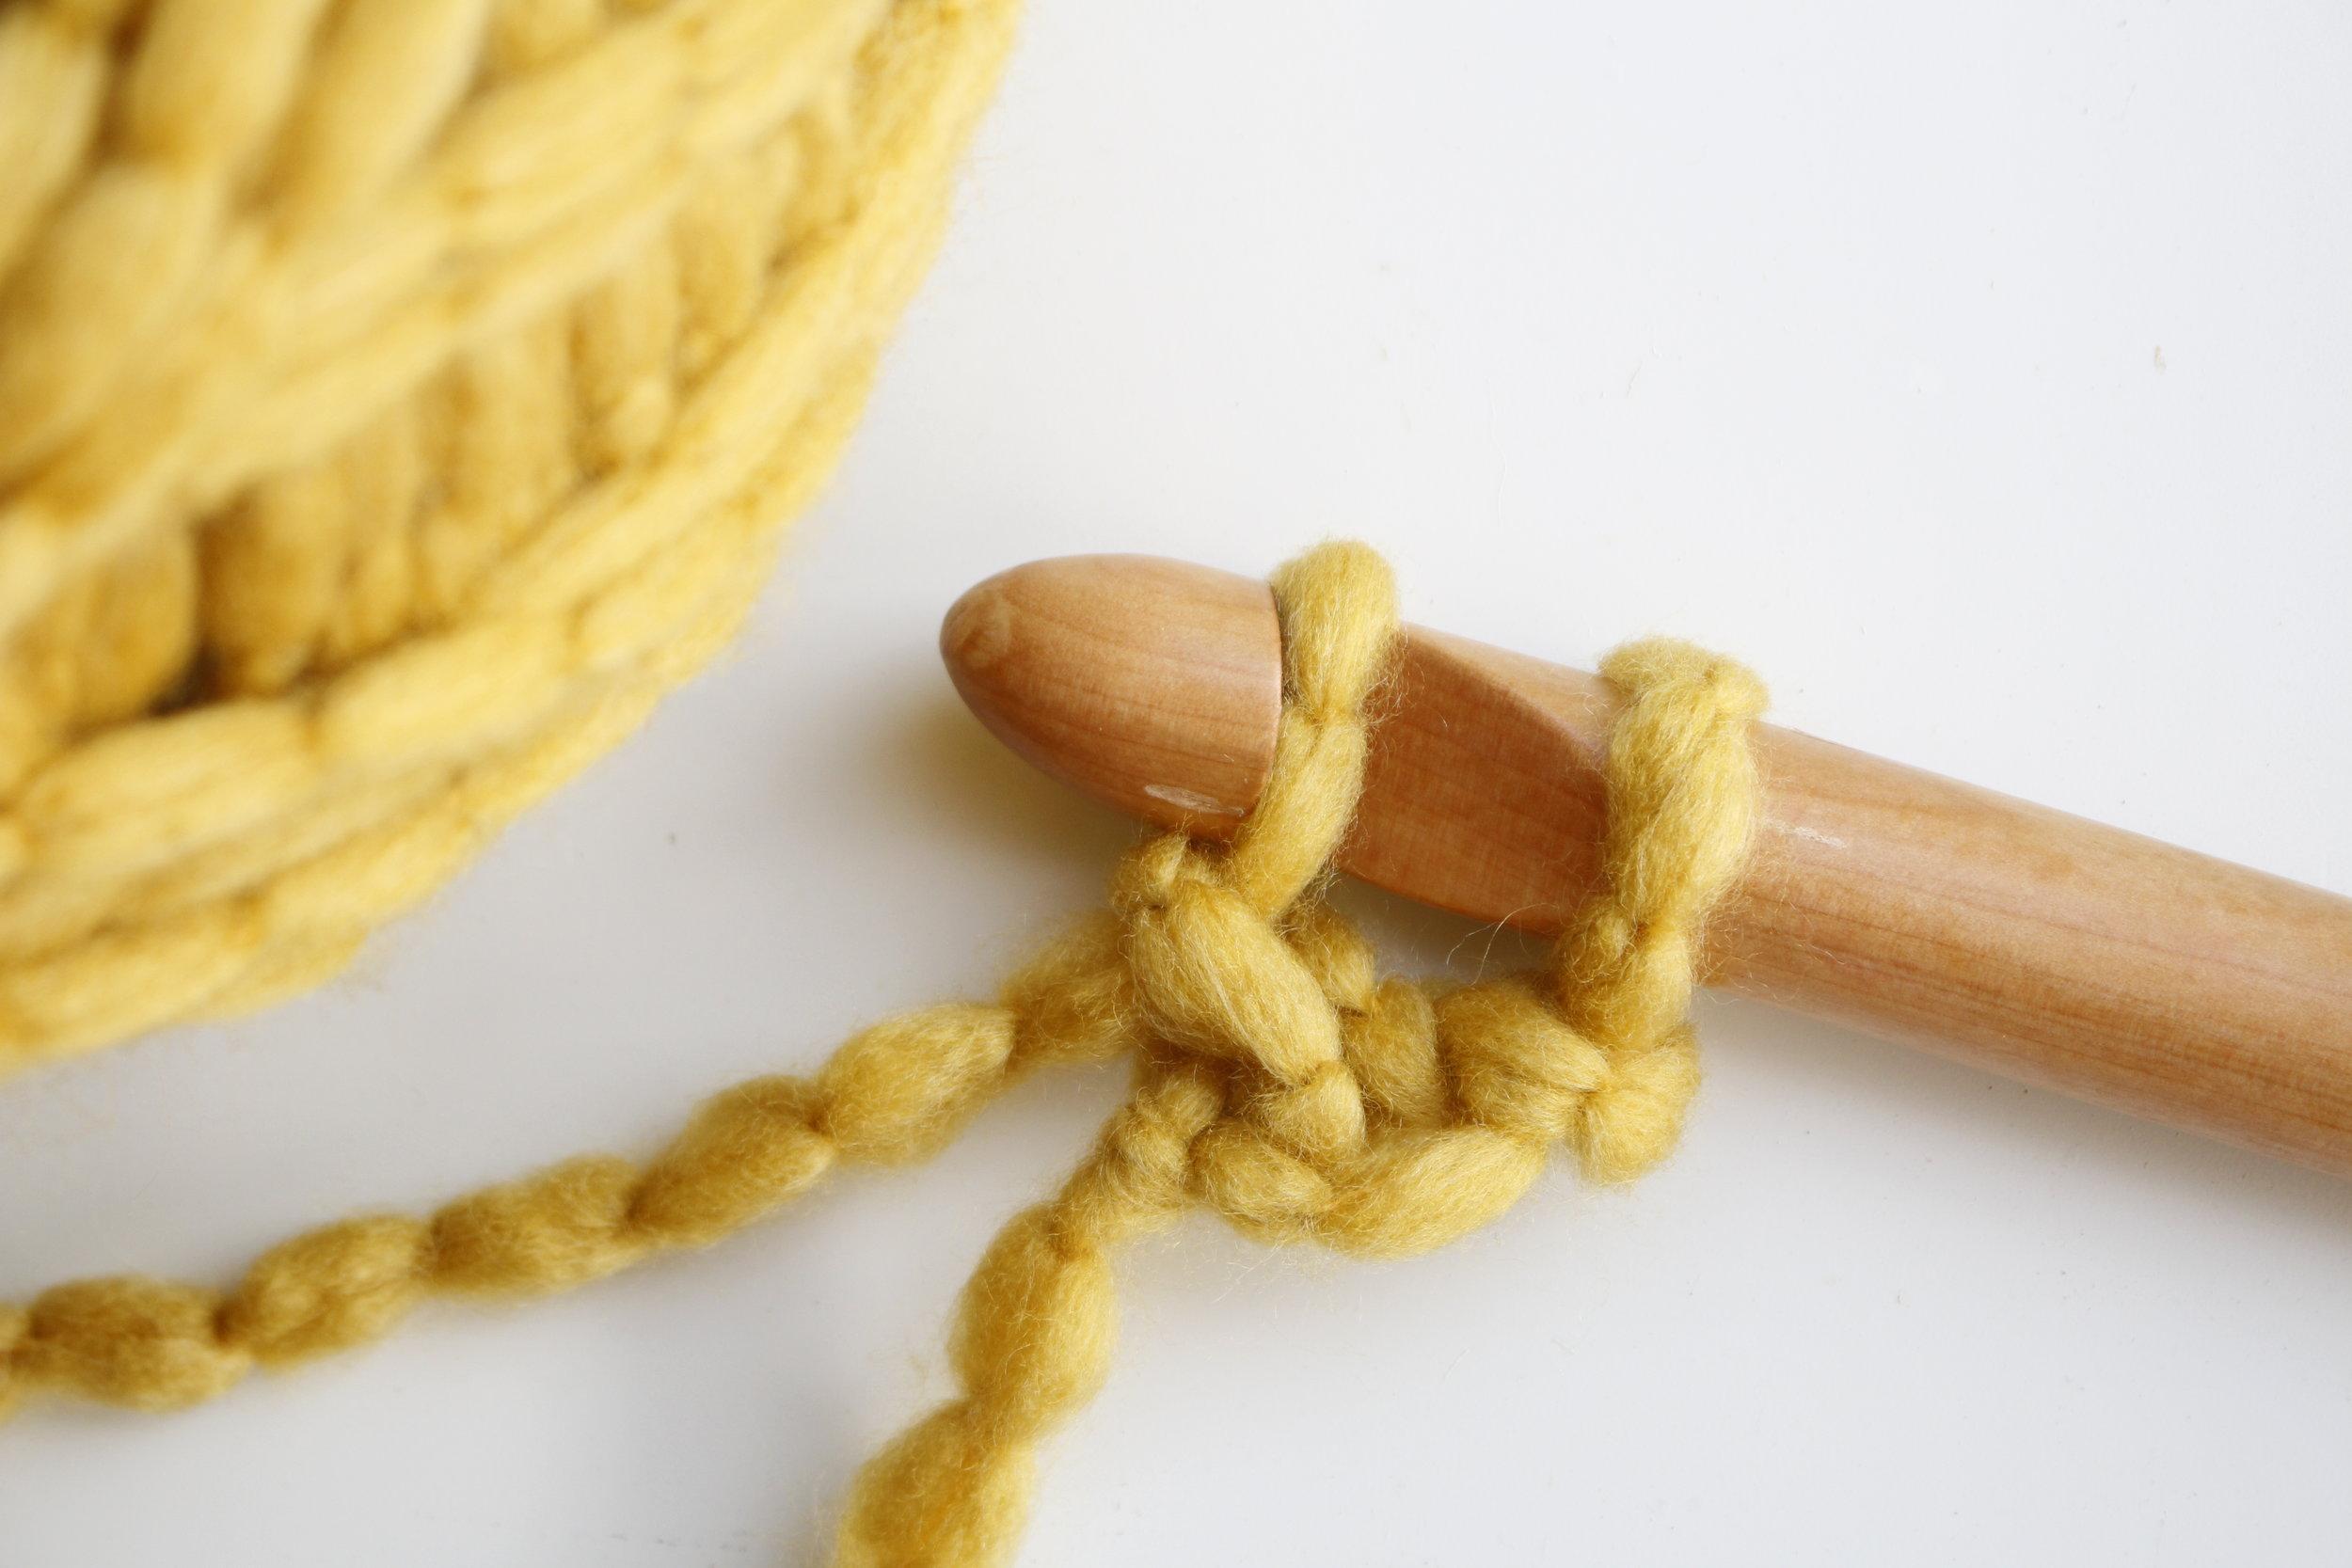 Foundational Single Crochet Stitch Tutorial Step 4